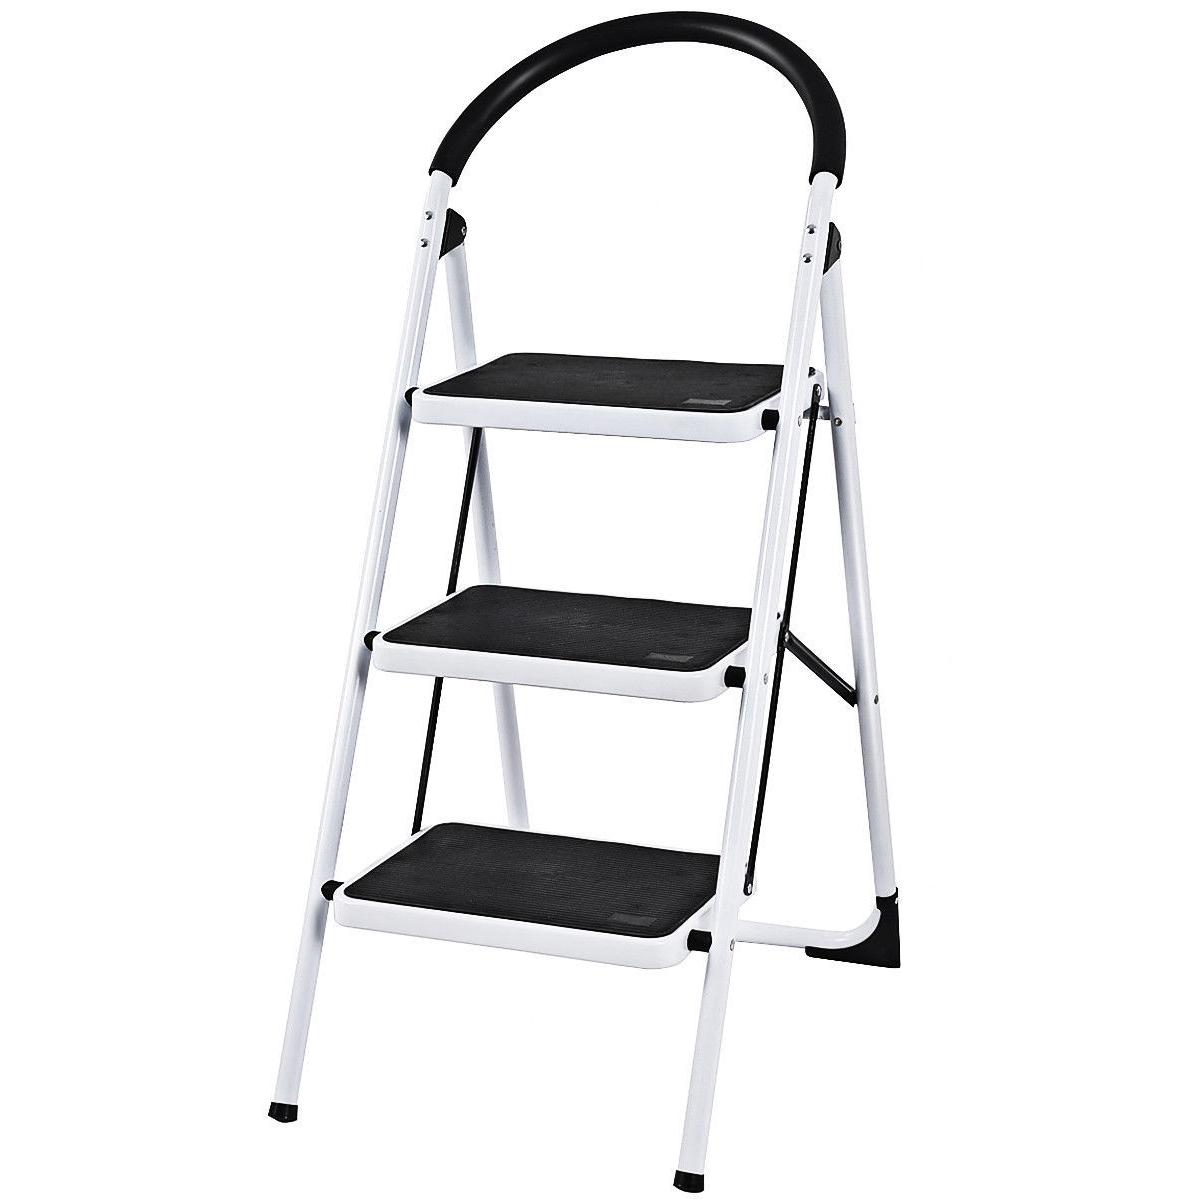 3 Step Ladder Folding Step Stool Platform Home Kitchen Tool Multiuse Stepladder W Sturdy Fre Rubber Hand Grip Anti Slip Pedal Lightweight Portable Ladder 330lbs Capacity